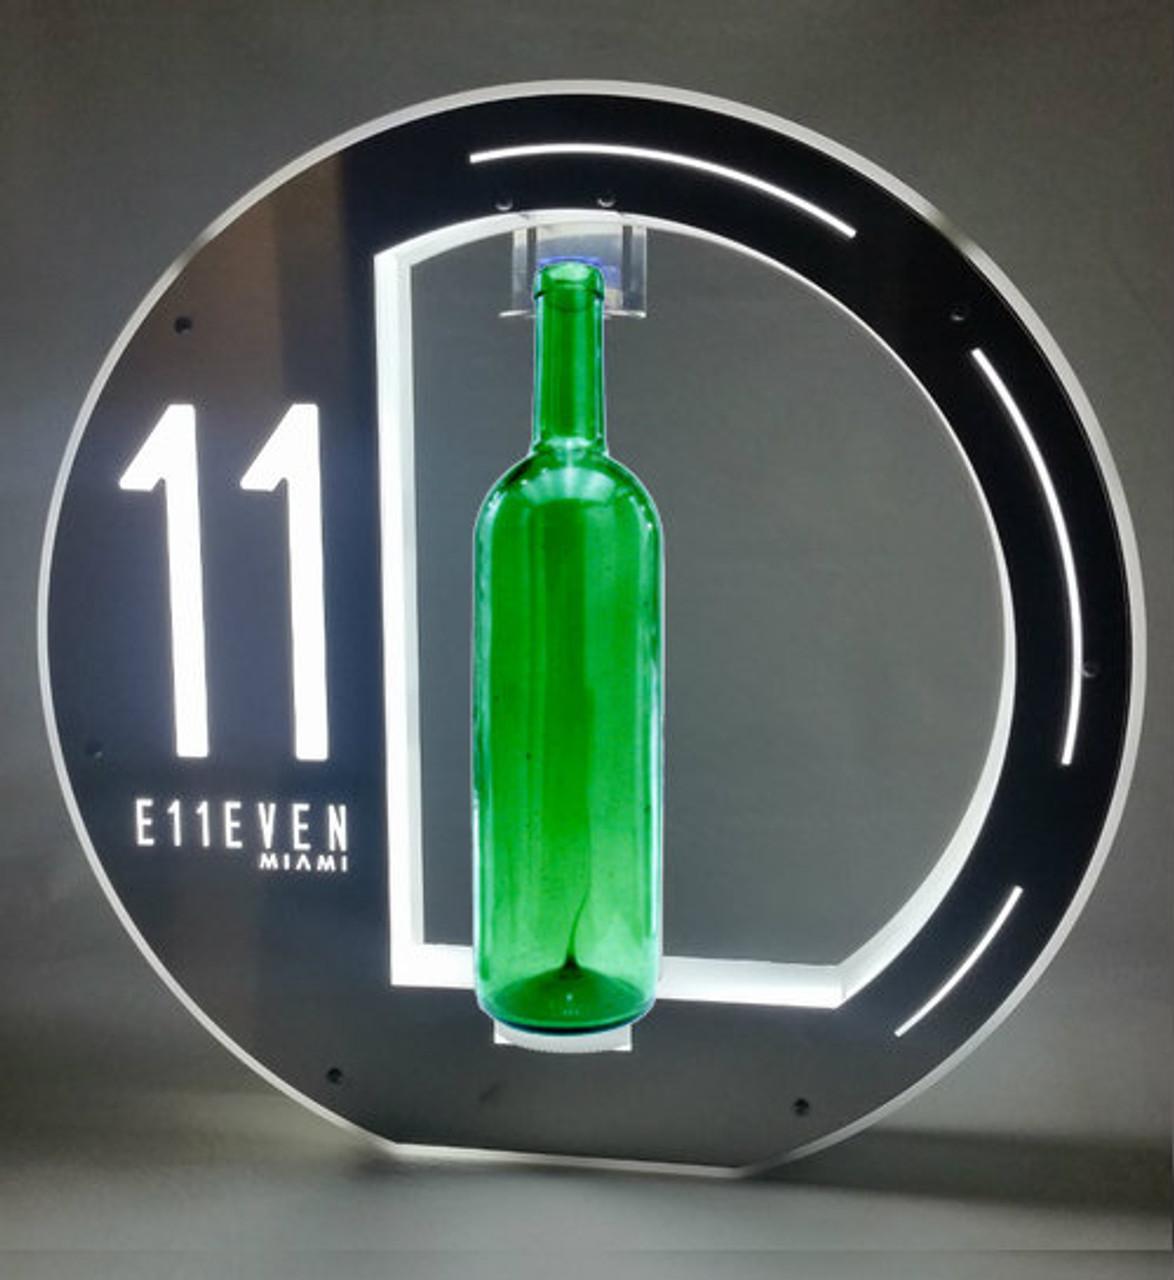 Elleven, Miami,miami beach,VIP, Liquor,Bottle Service Tray, bottleService,Bottle Service,Tray, Caddie, Carrier, Presenter, Caddy, VIP tray, Custom, Personalized, Liquor Tray, Champagne, Champagne Tray, LED Tray, delivery, Nightclub, LEDTray, Light up, illuminated,custom made, Logo,name, customized